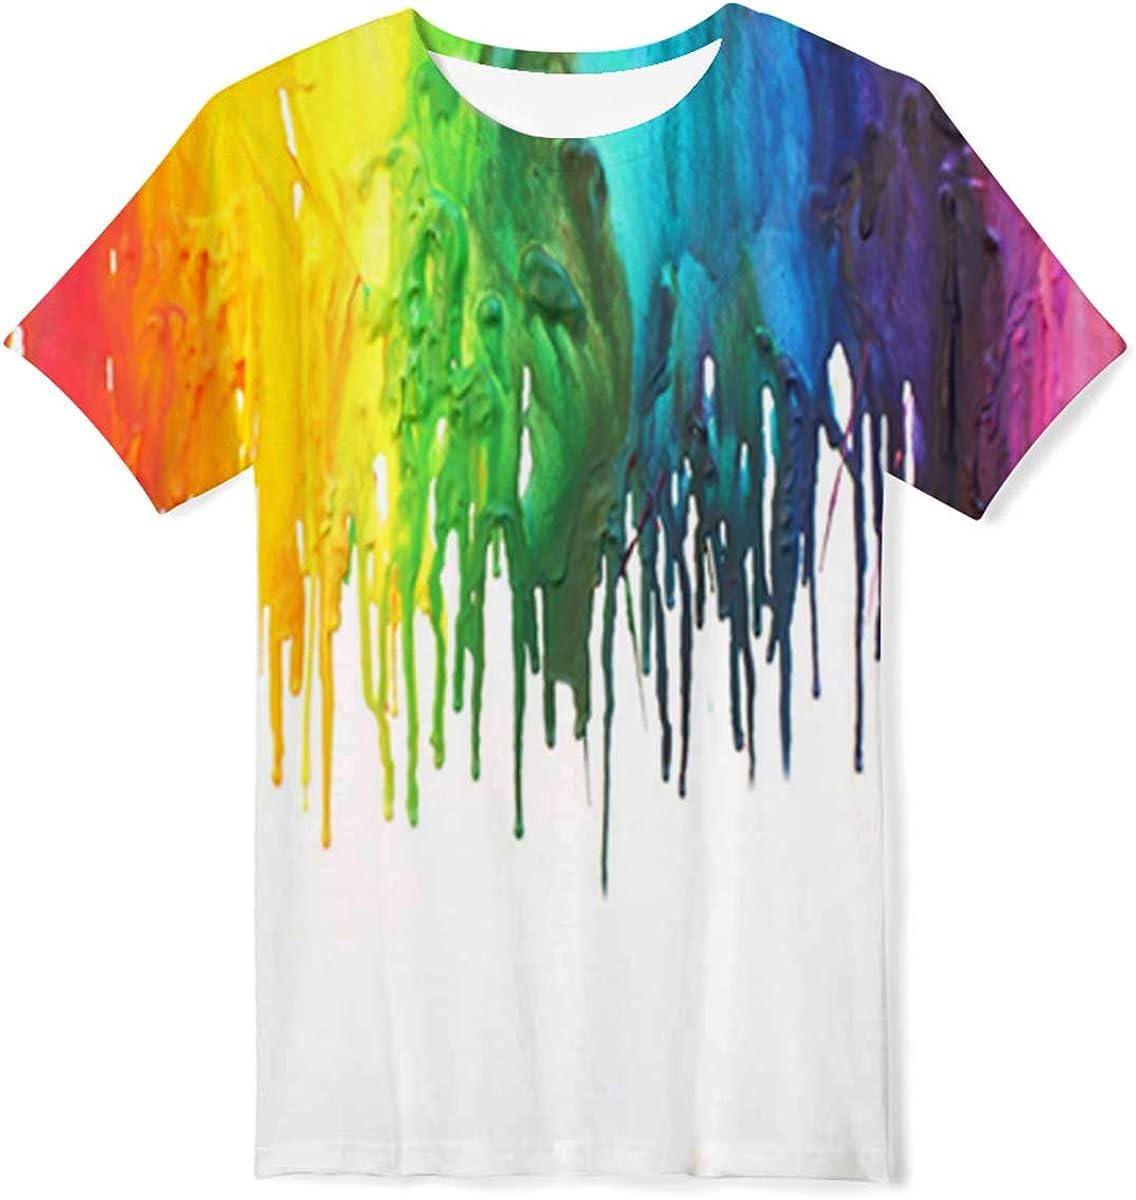 ALISISTER Camisetas Ni/ños 3D Divertidas Impresa Manga Corta Verano T-Shirt Top 4-14 A/ños